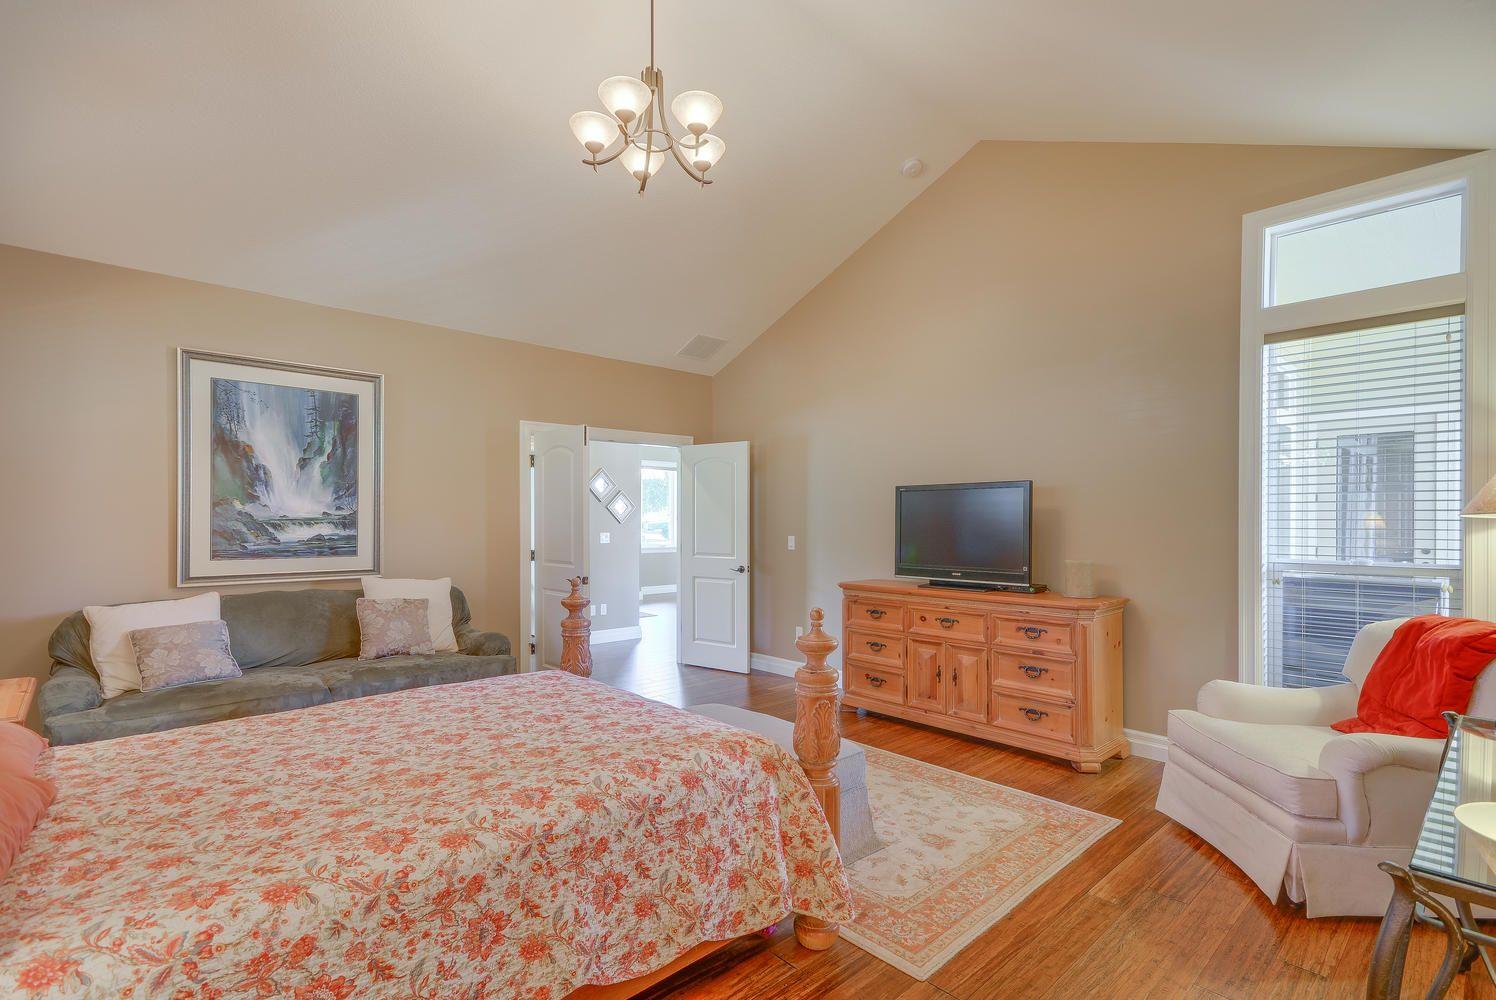 Mascord Design Renville » Quail Homes Home, Interior